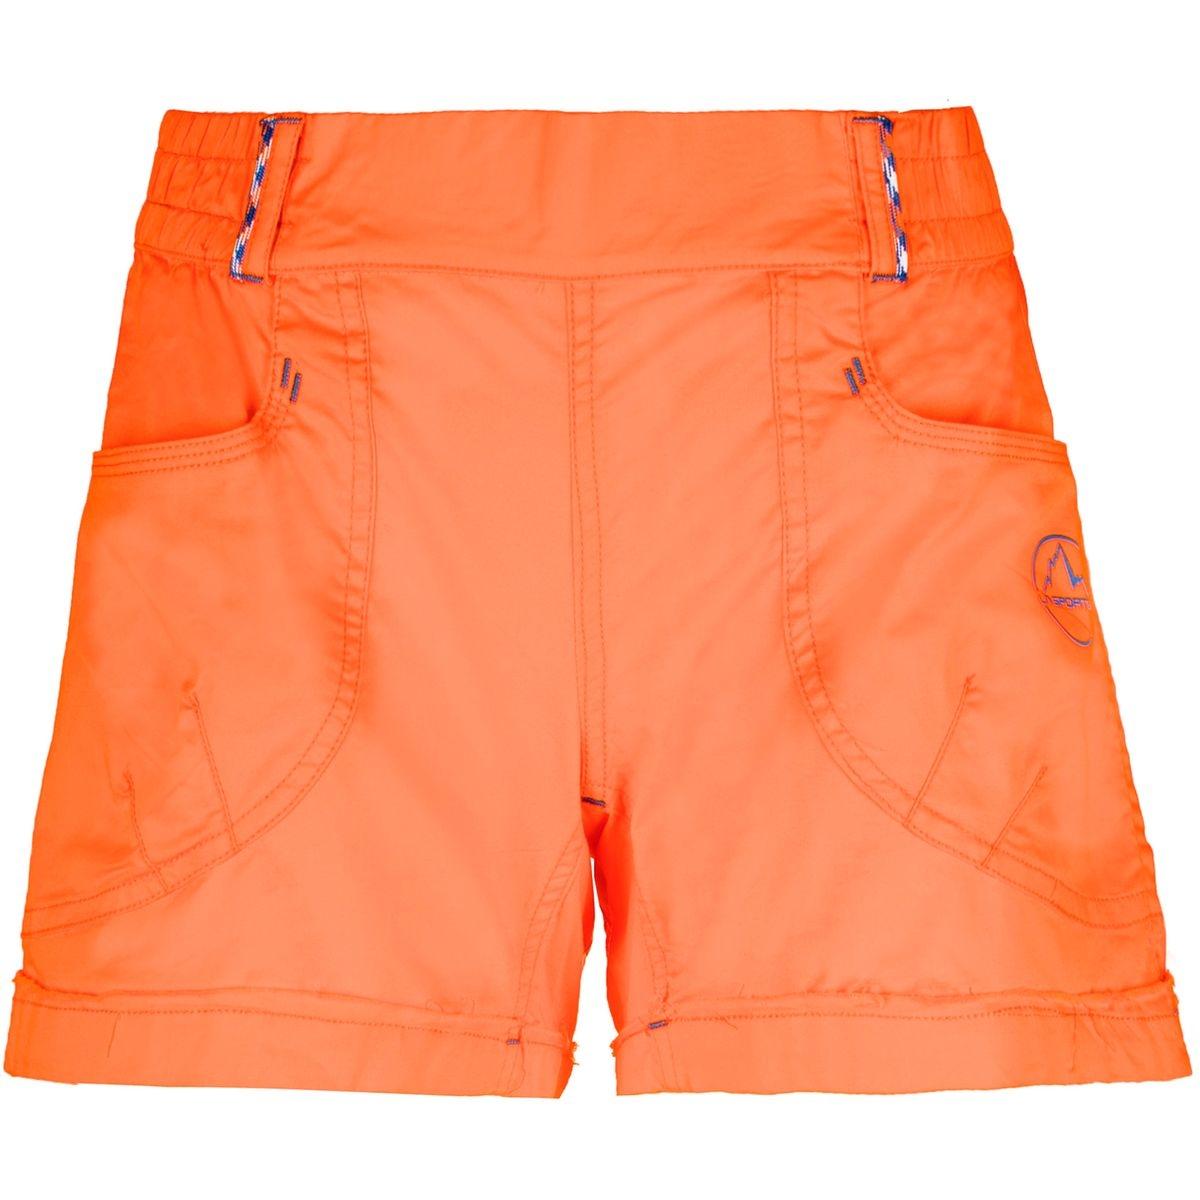 Escape - Shorts Femme - orange